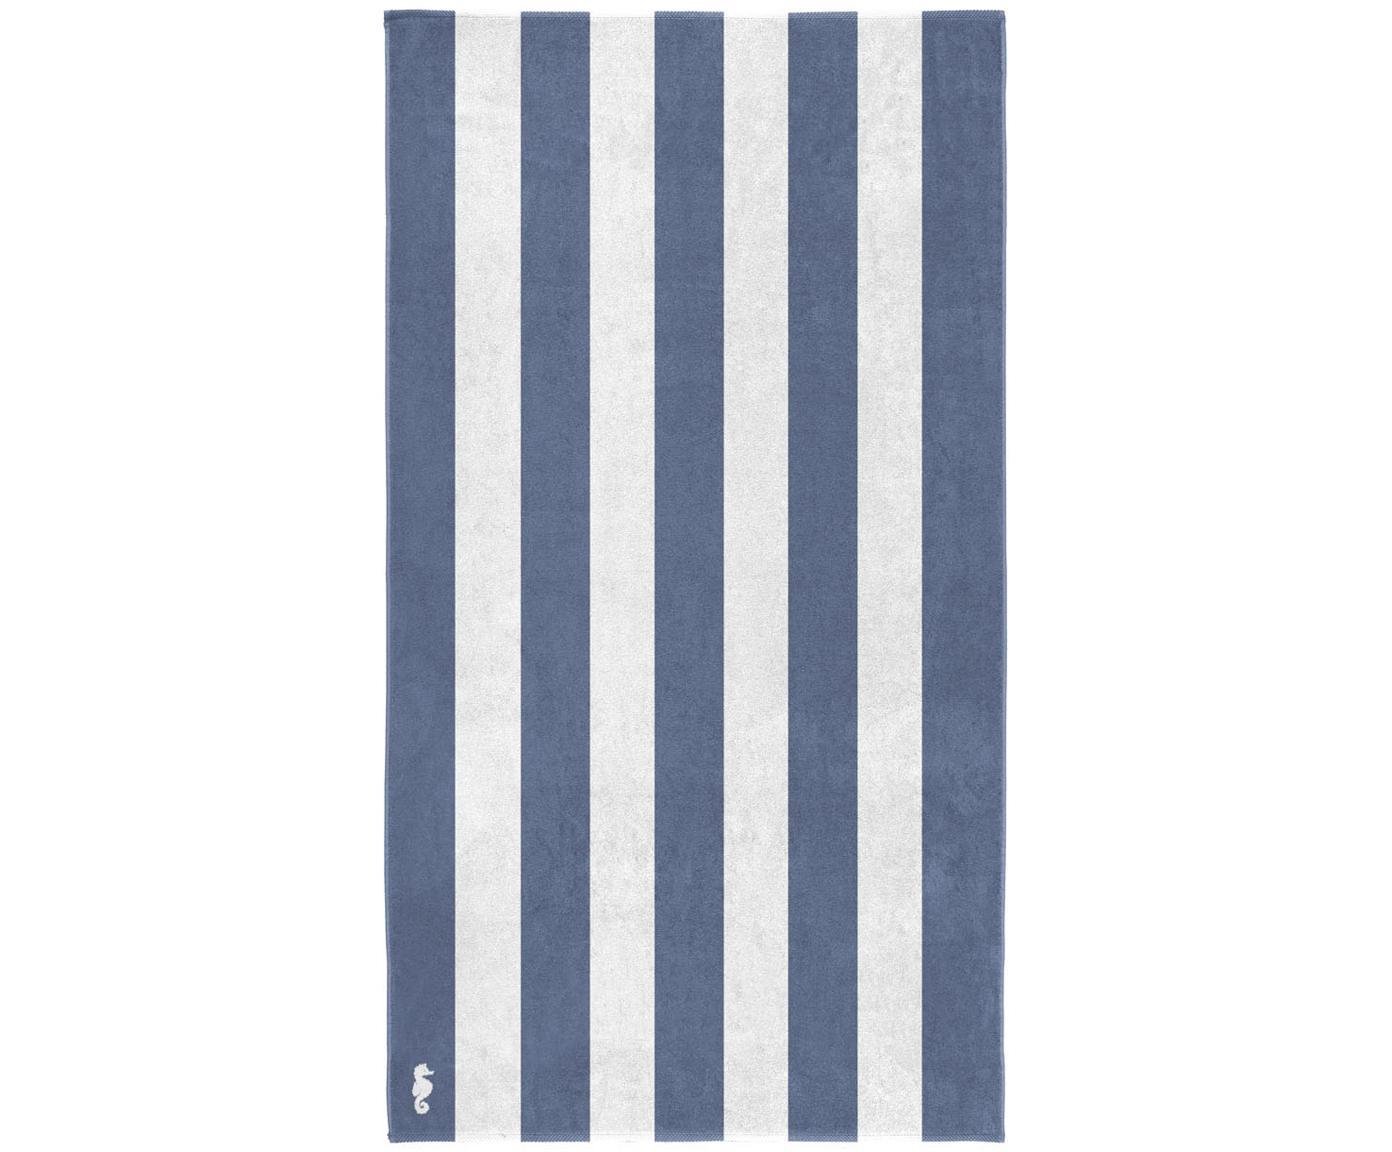 Strandlaken Vamos, Egyptisch katoen, middelzware kwaliteit 420 g/m², Blauw, wit, 100 x 180 cm